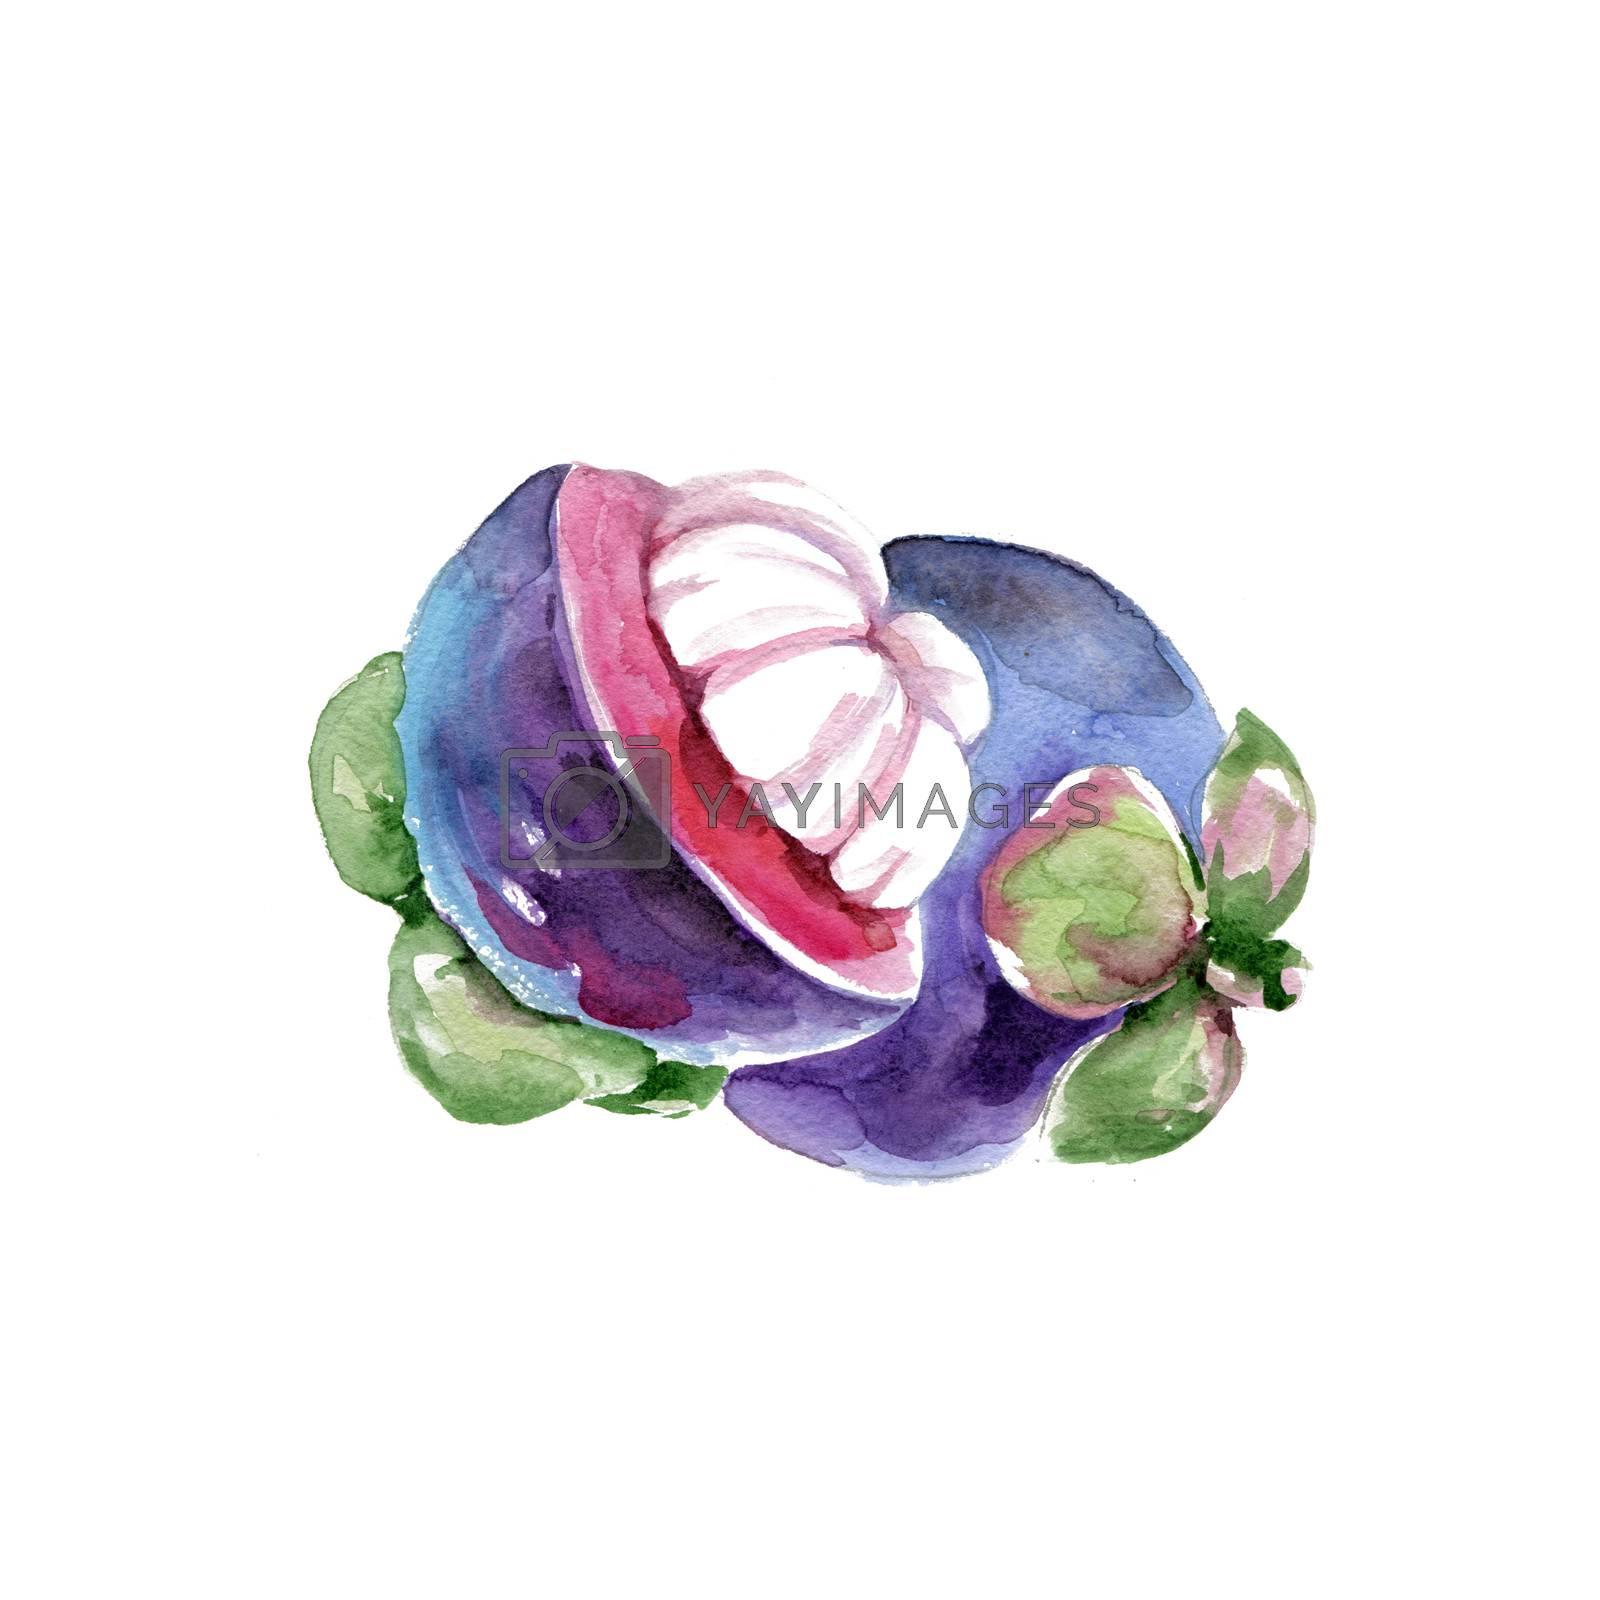 Watercolor Mangosteen. Hand Drawn Illustration Organic Food Vegetarian Ingredient